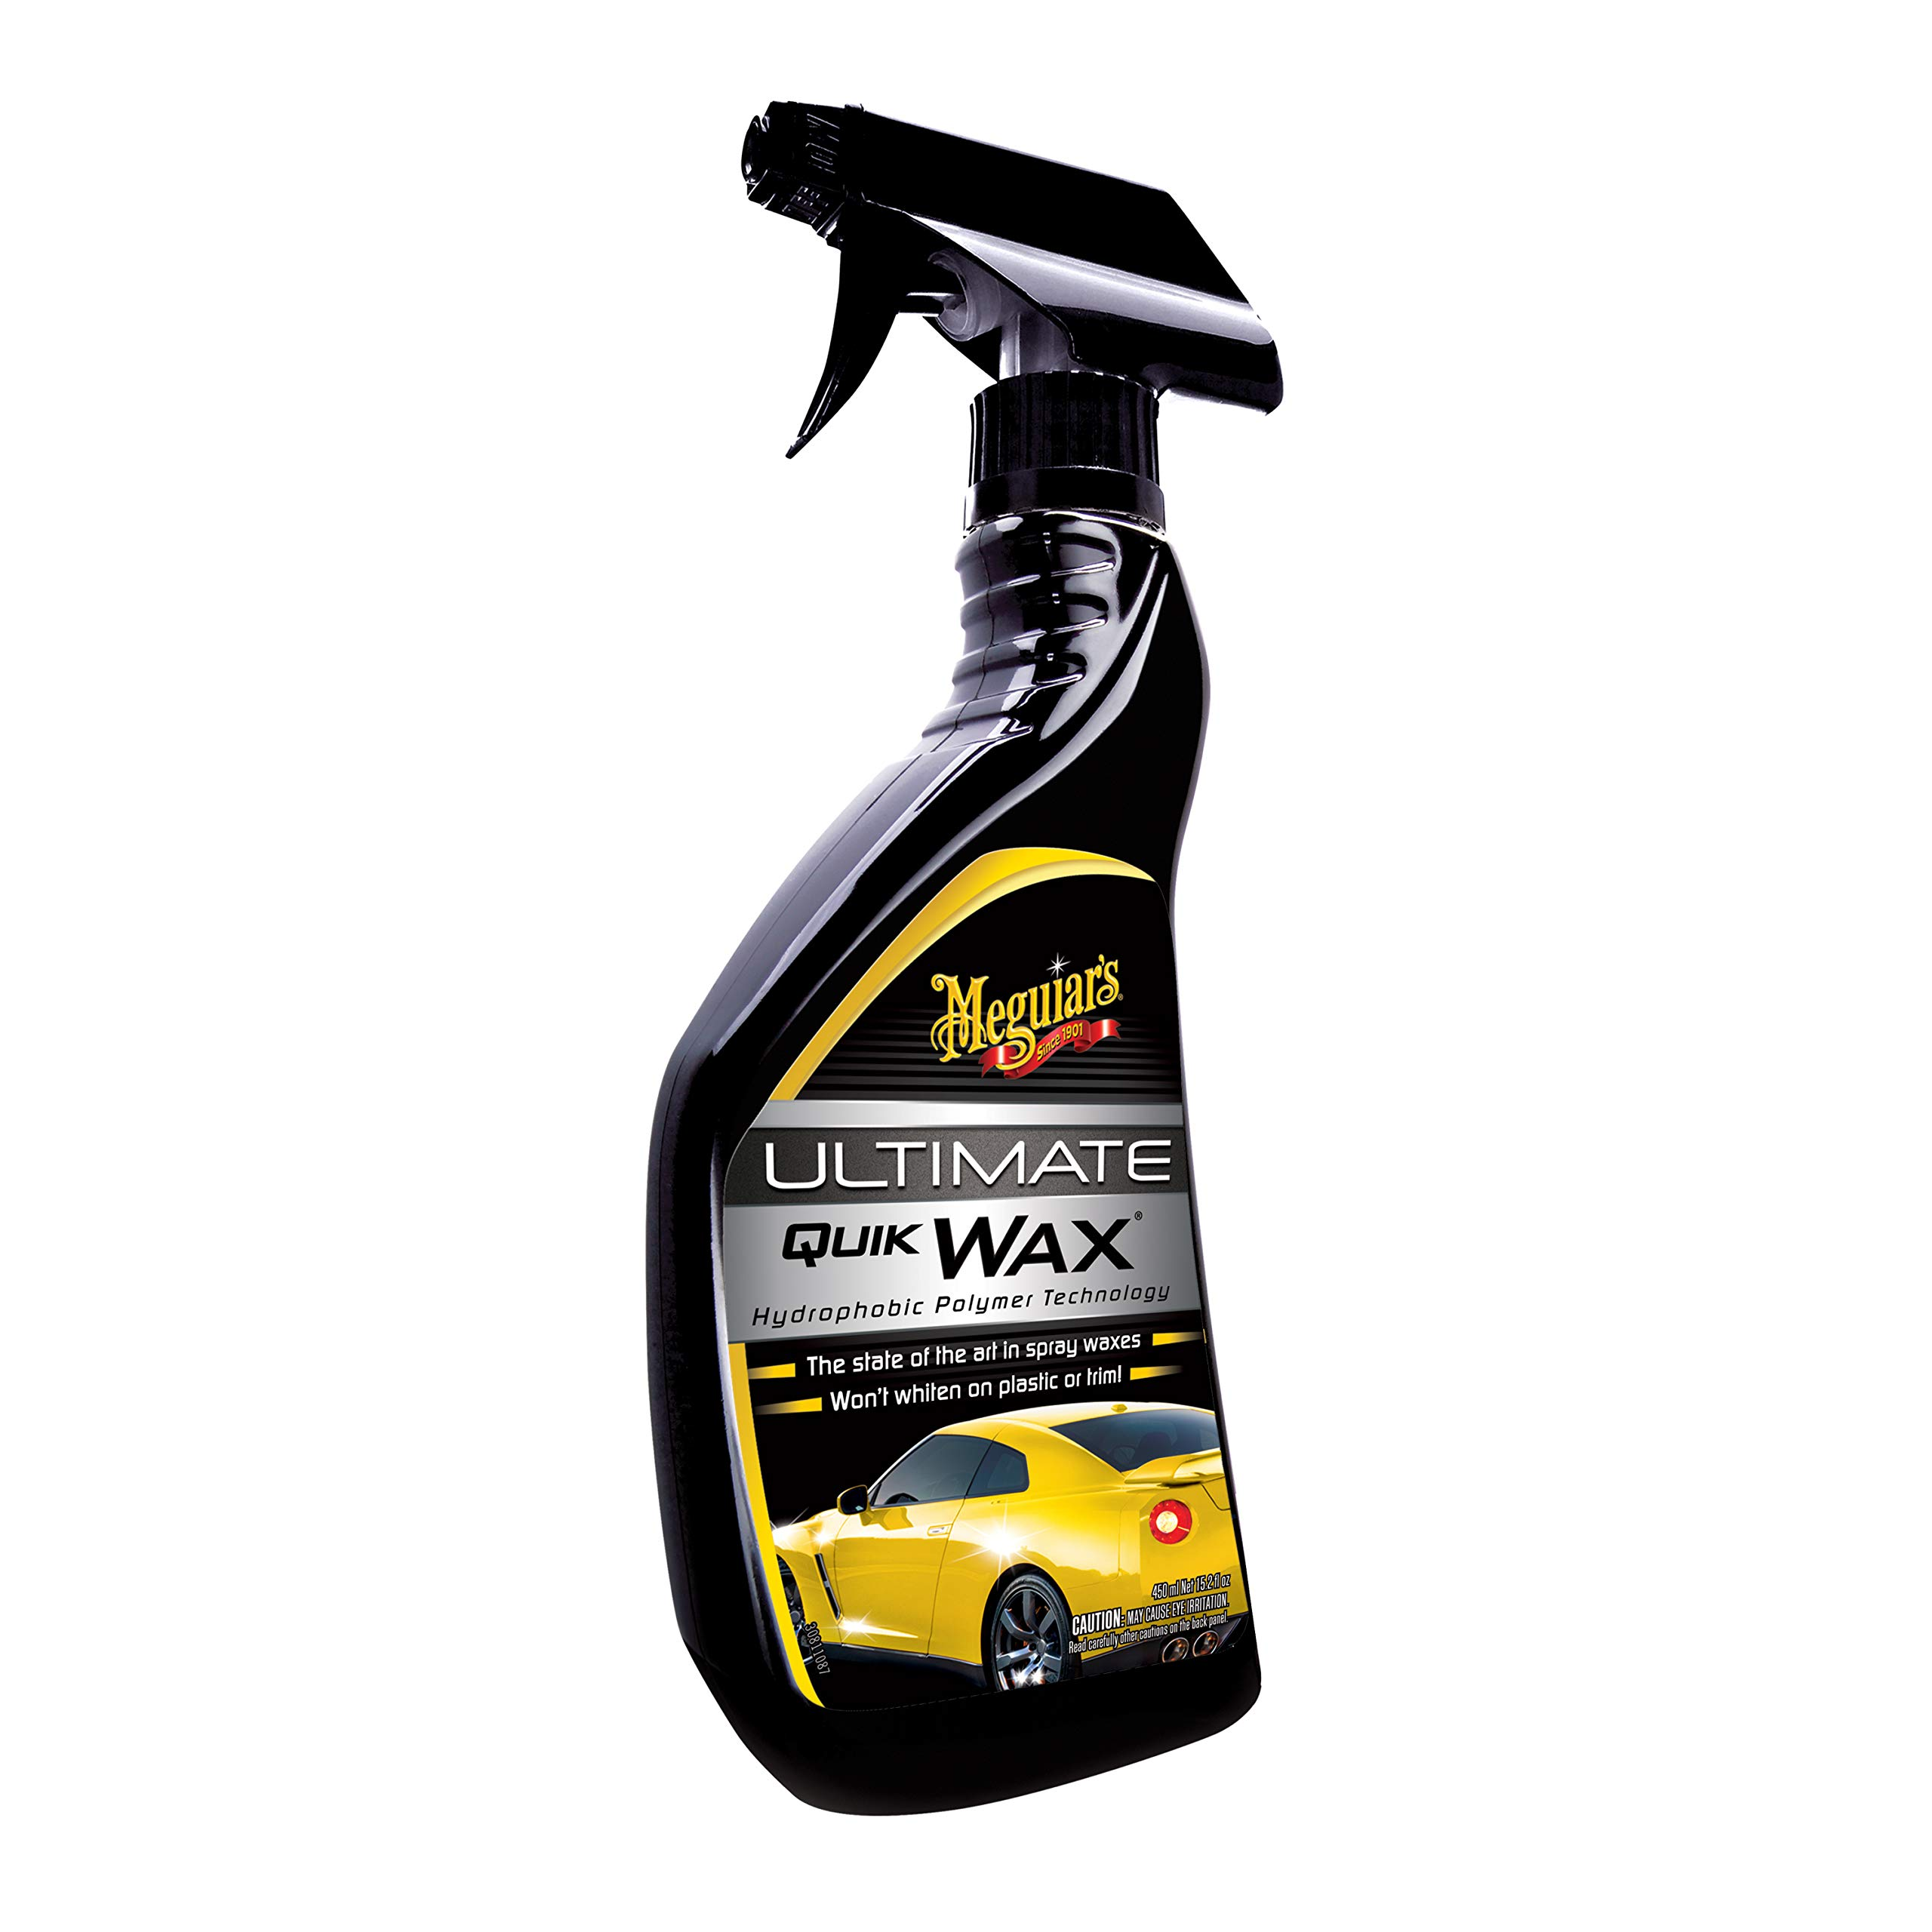 Meguiars G17516 Ultimate Quik Wax